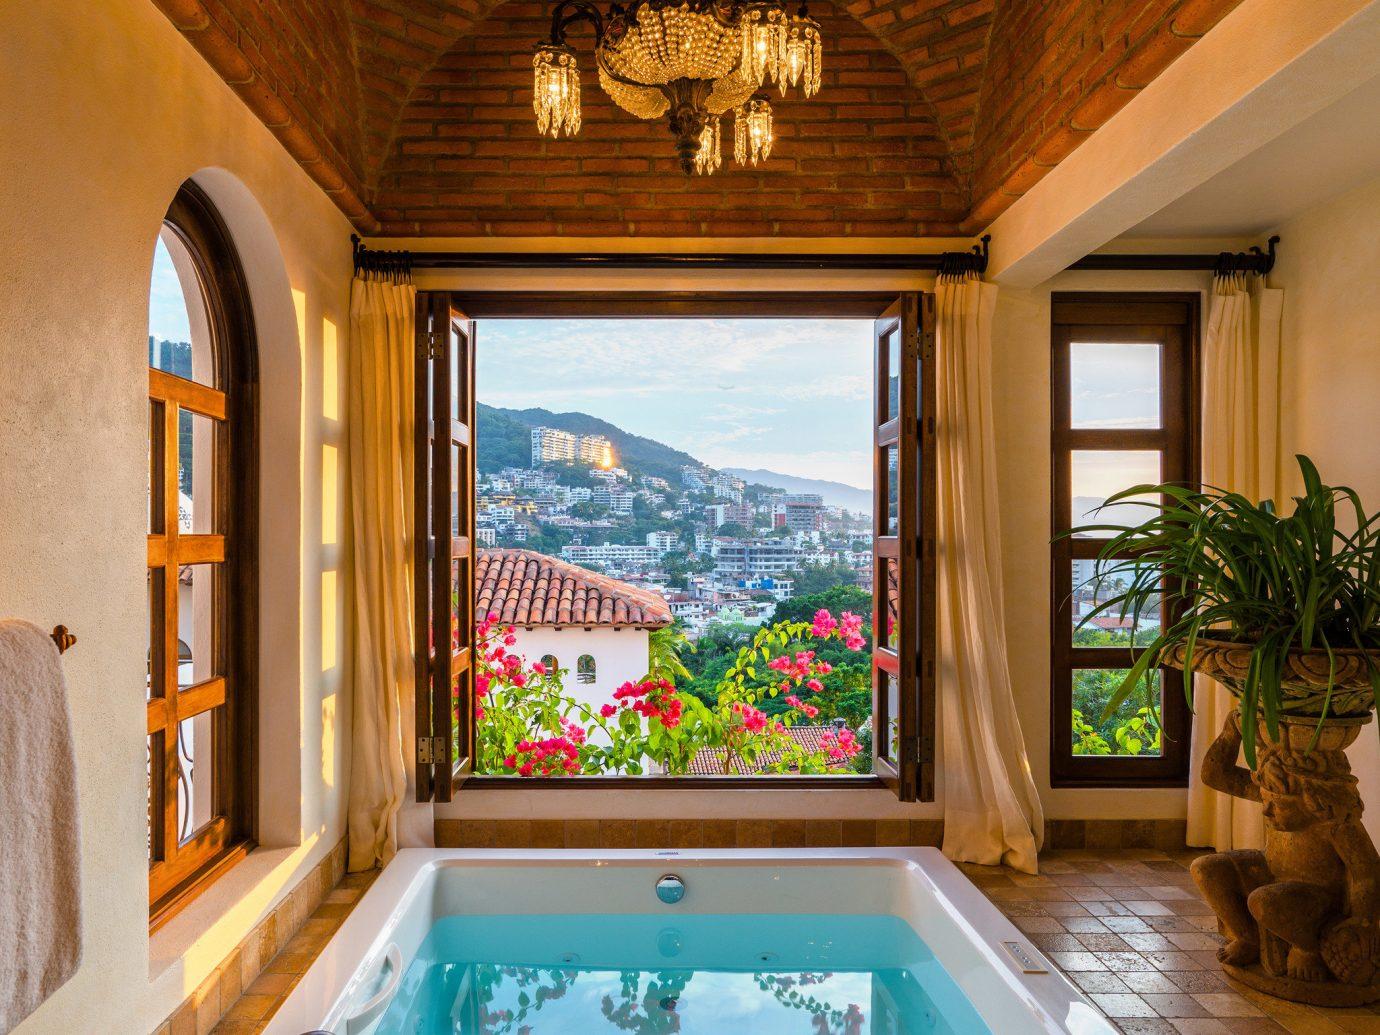 Hotels Romance indoor swimming pool room estate property house building home mansion floor interior design Villa